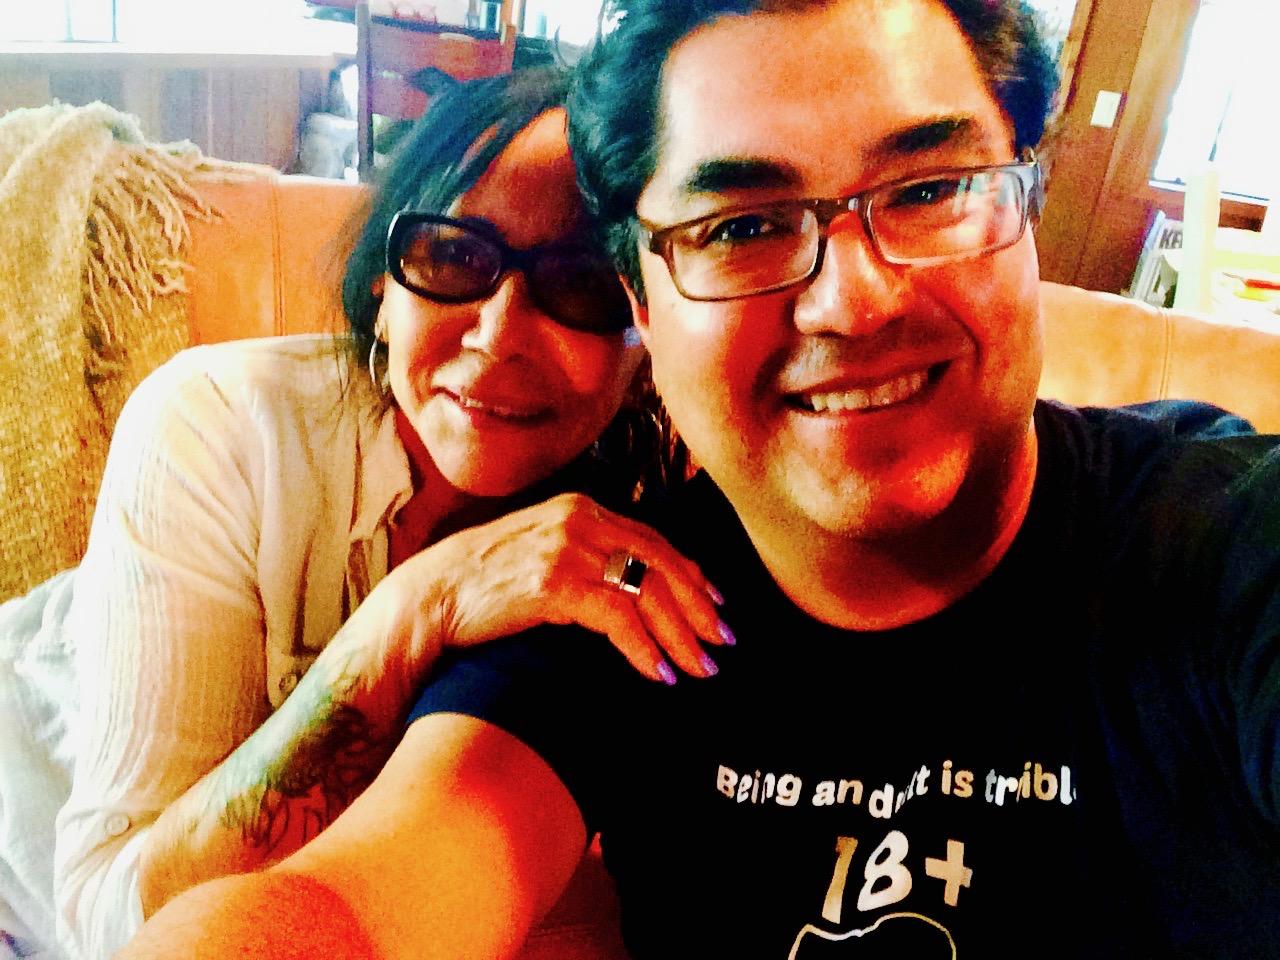 Anita Acosta and Podcast Host Marcos Nájera take a break from talking.